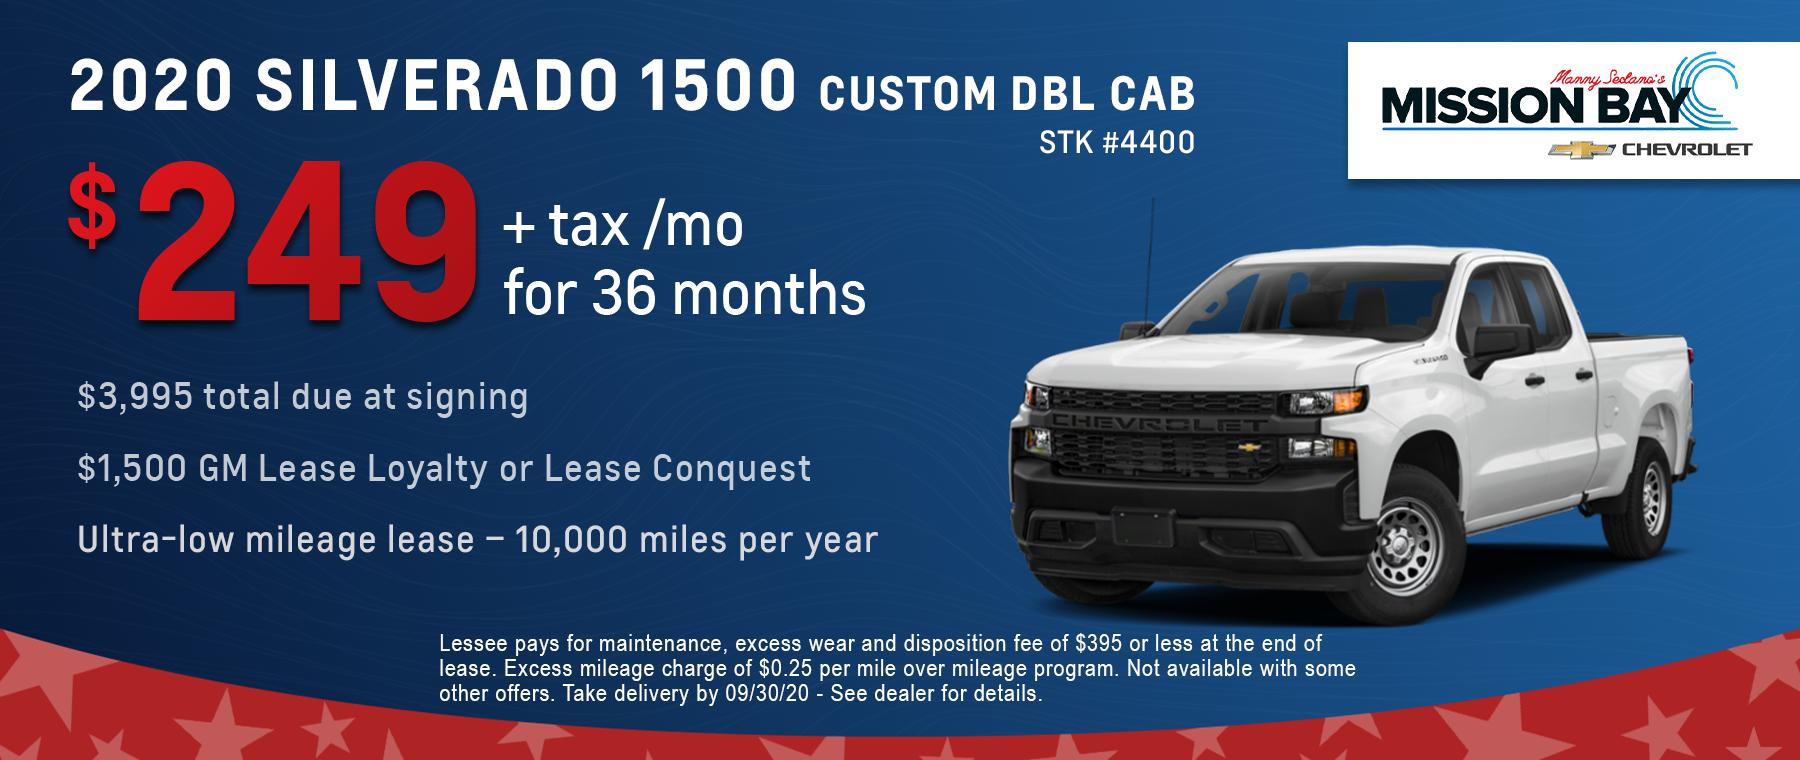 New 2020 Chevy Silverado 1500 lease deals at San Diego Chevrolet dealership